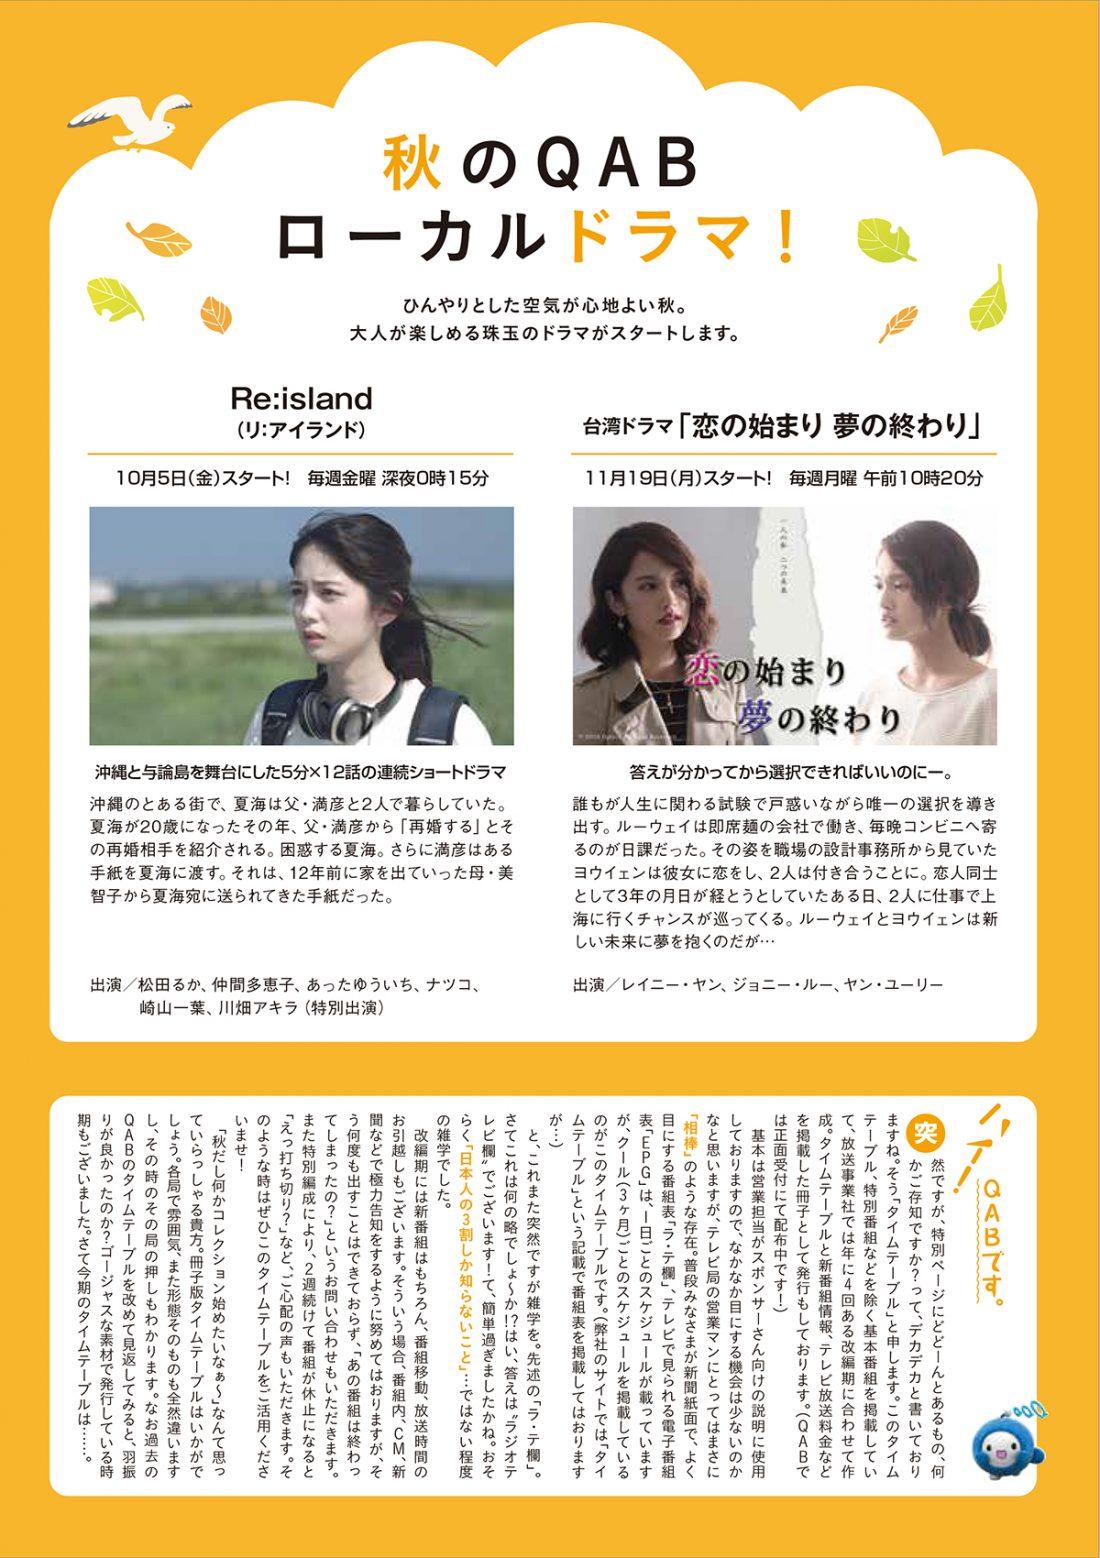 https://www.qab.co.jp/qgoro/wp-content/uploads/quun_1017-1100x1558.jpg